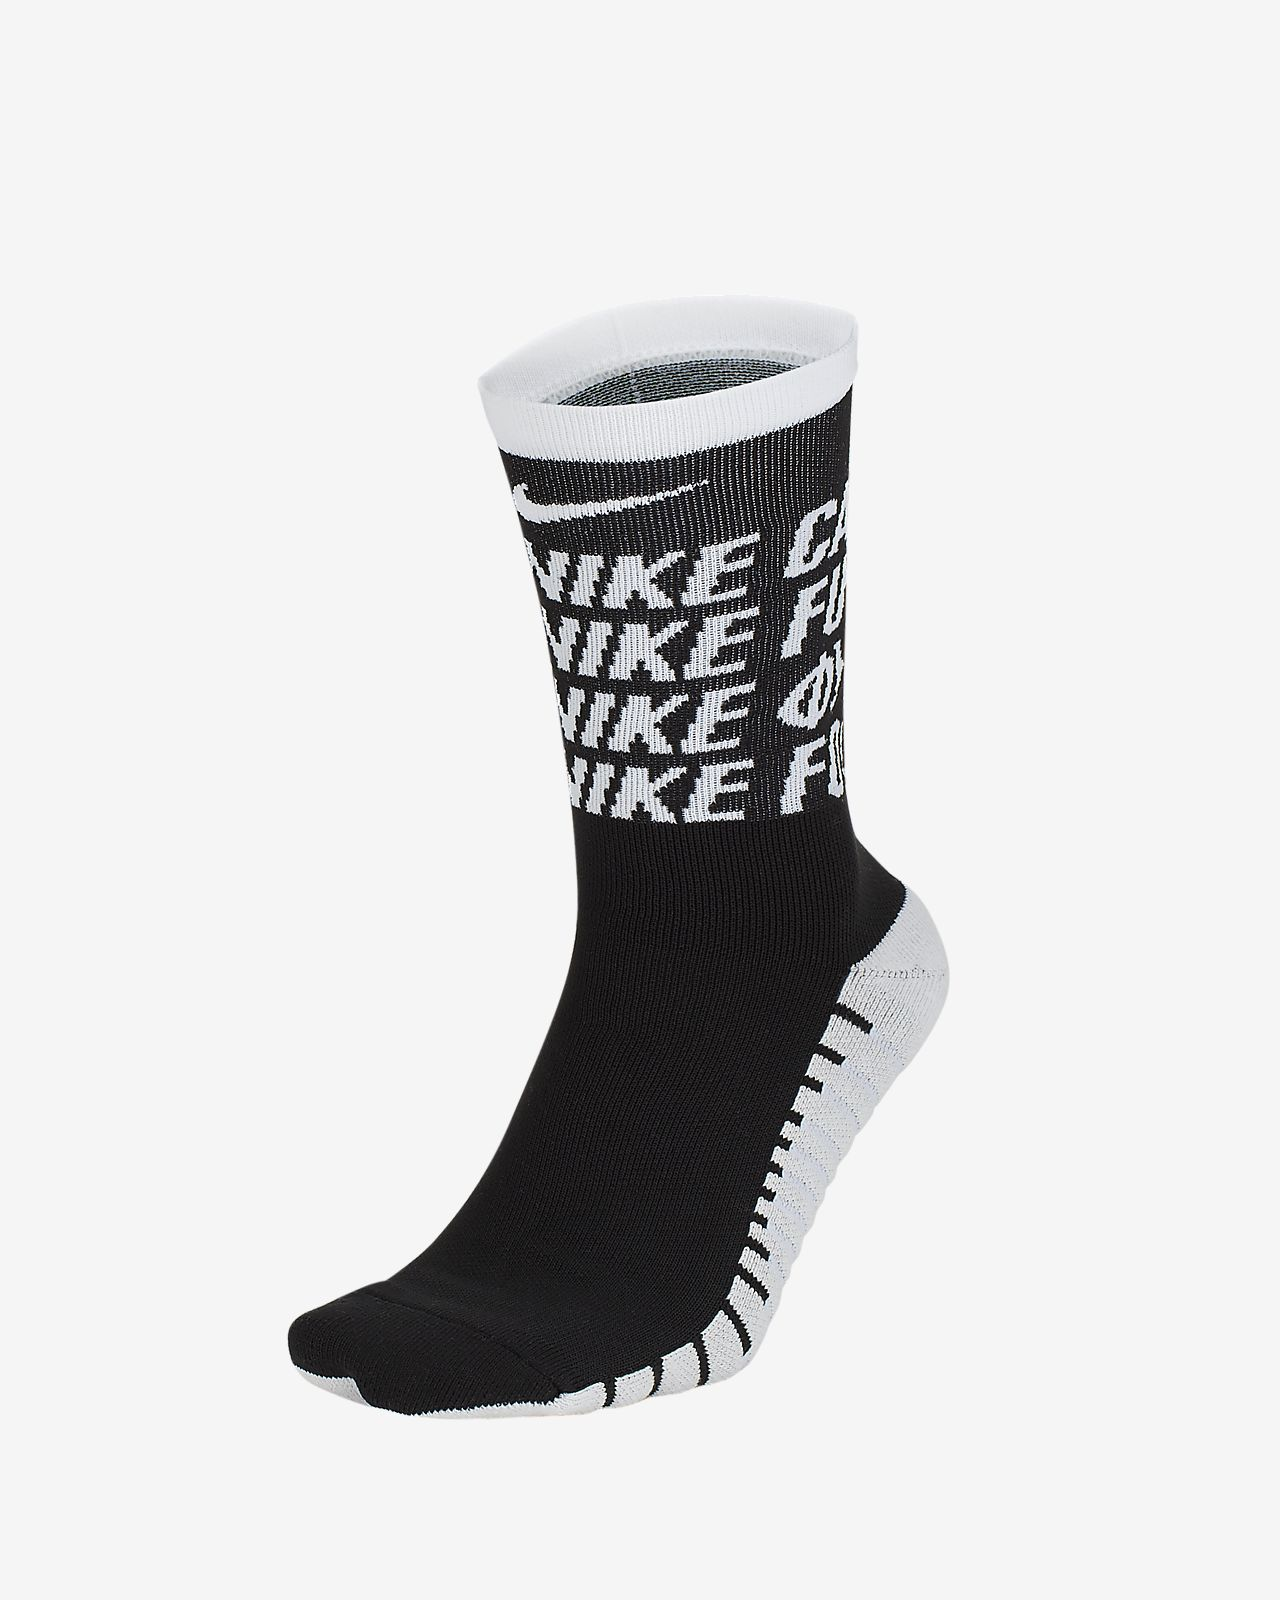 Chaussettes de football mi-mollet Nike F.C. Squad